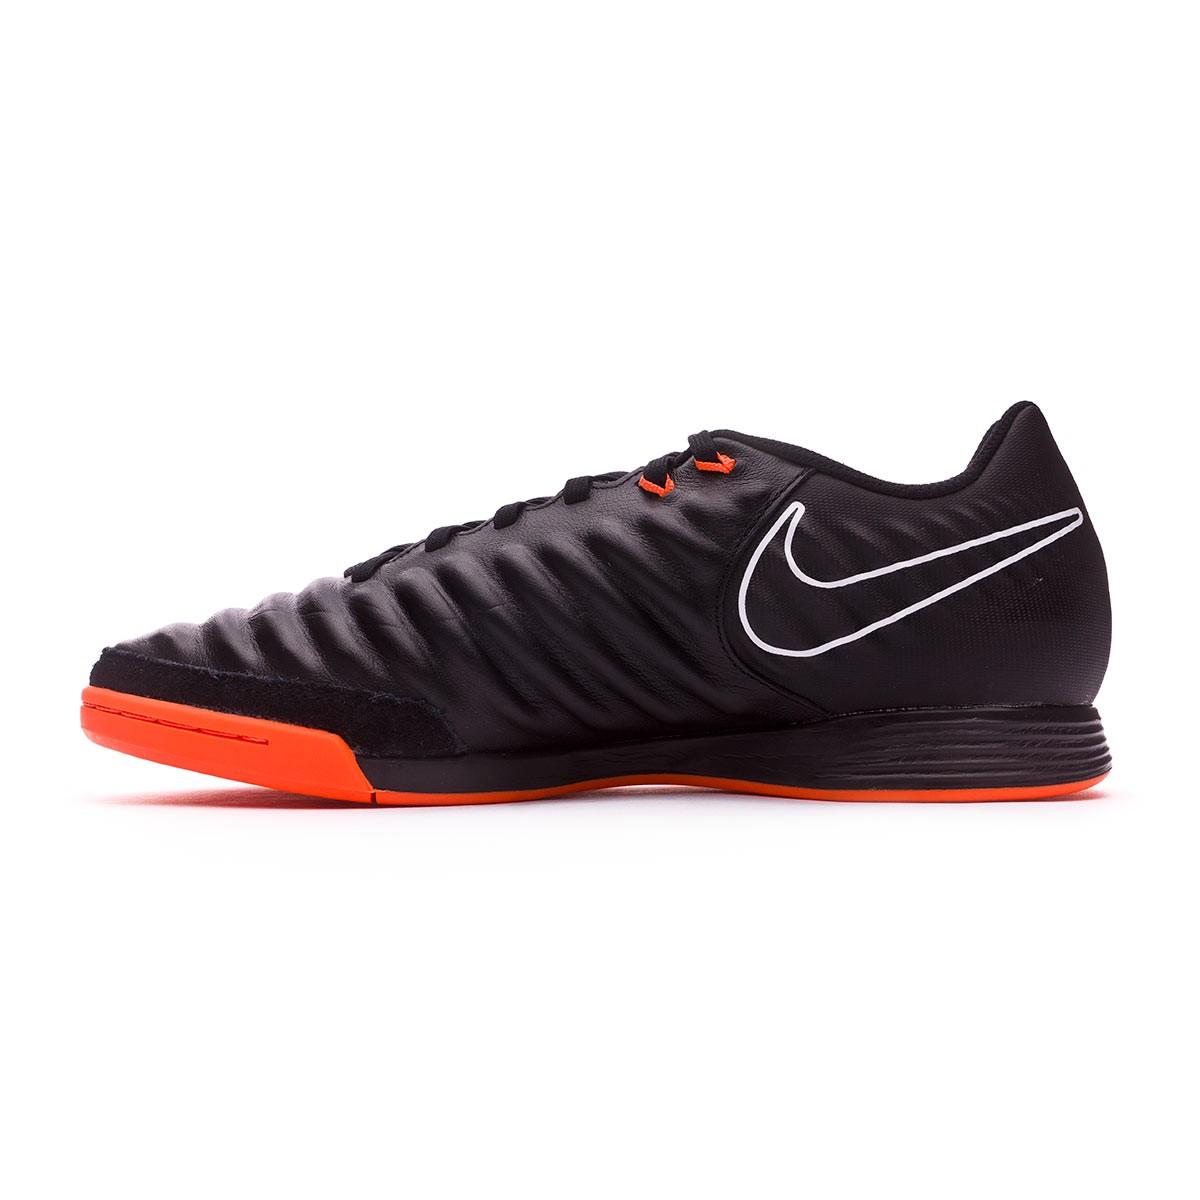 8d03654800cb4 Scarpe Nike Tiempo LegendX VII Academy IC Black-Total orange-White -  Negozio di calcio Fútbol Emotion